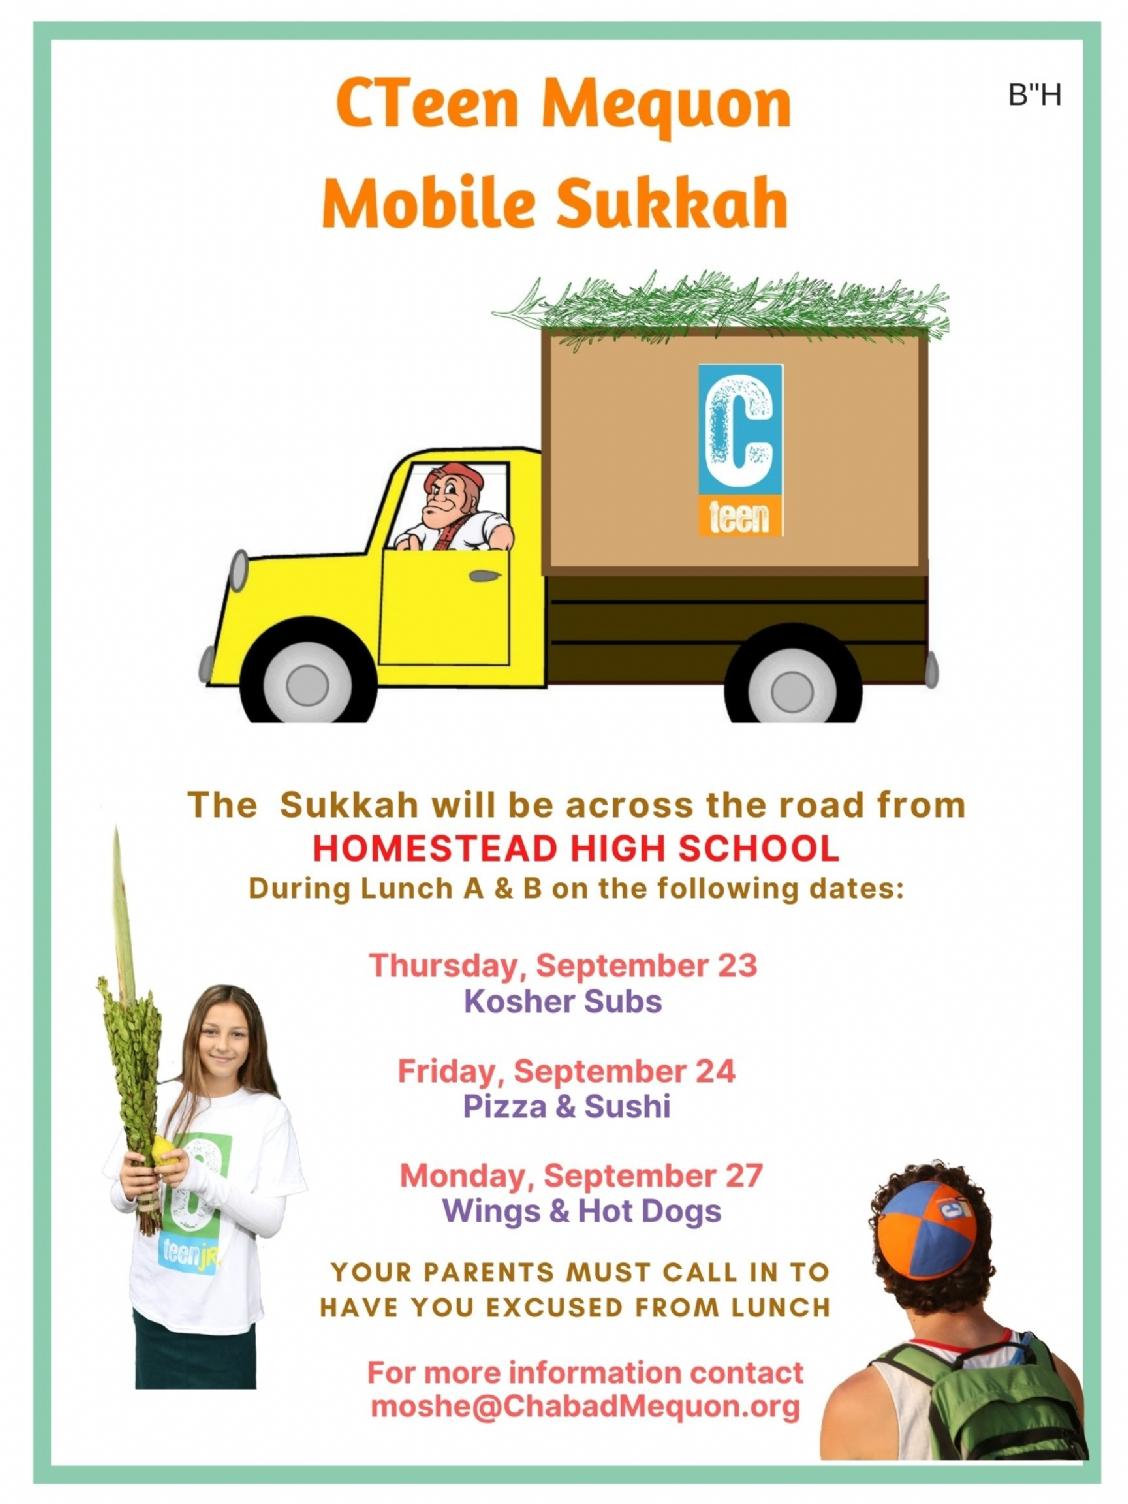 Homestead Sukkah Mobile (1).png